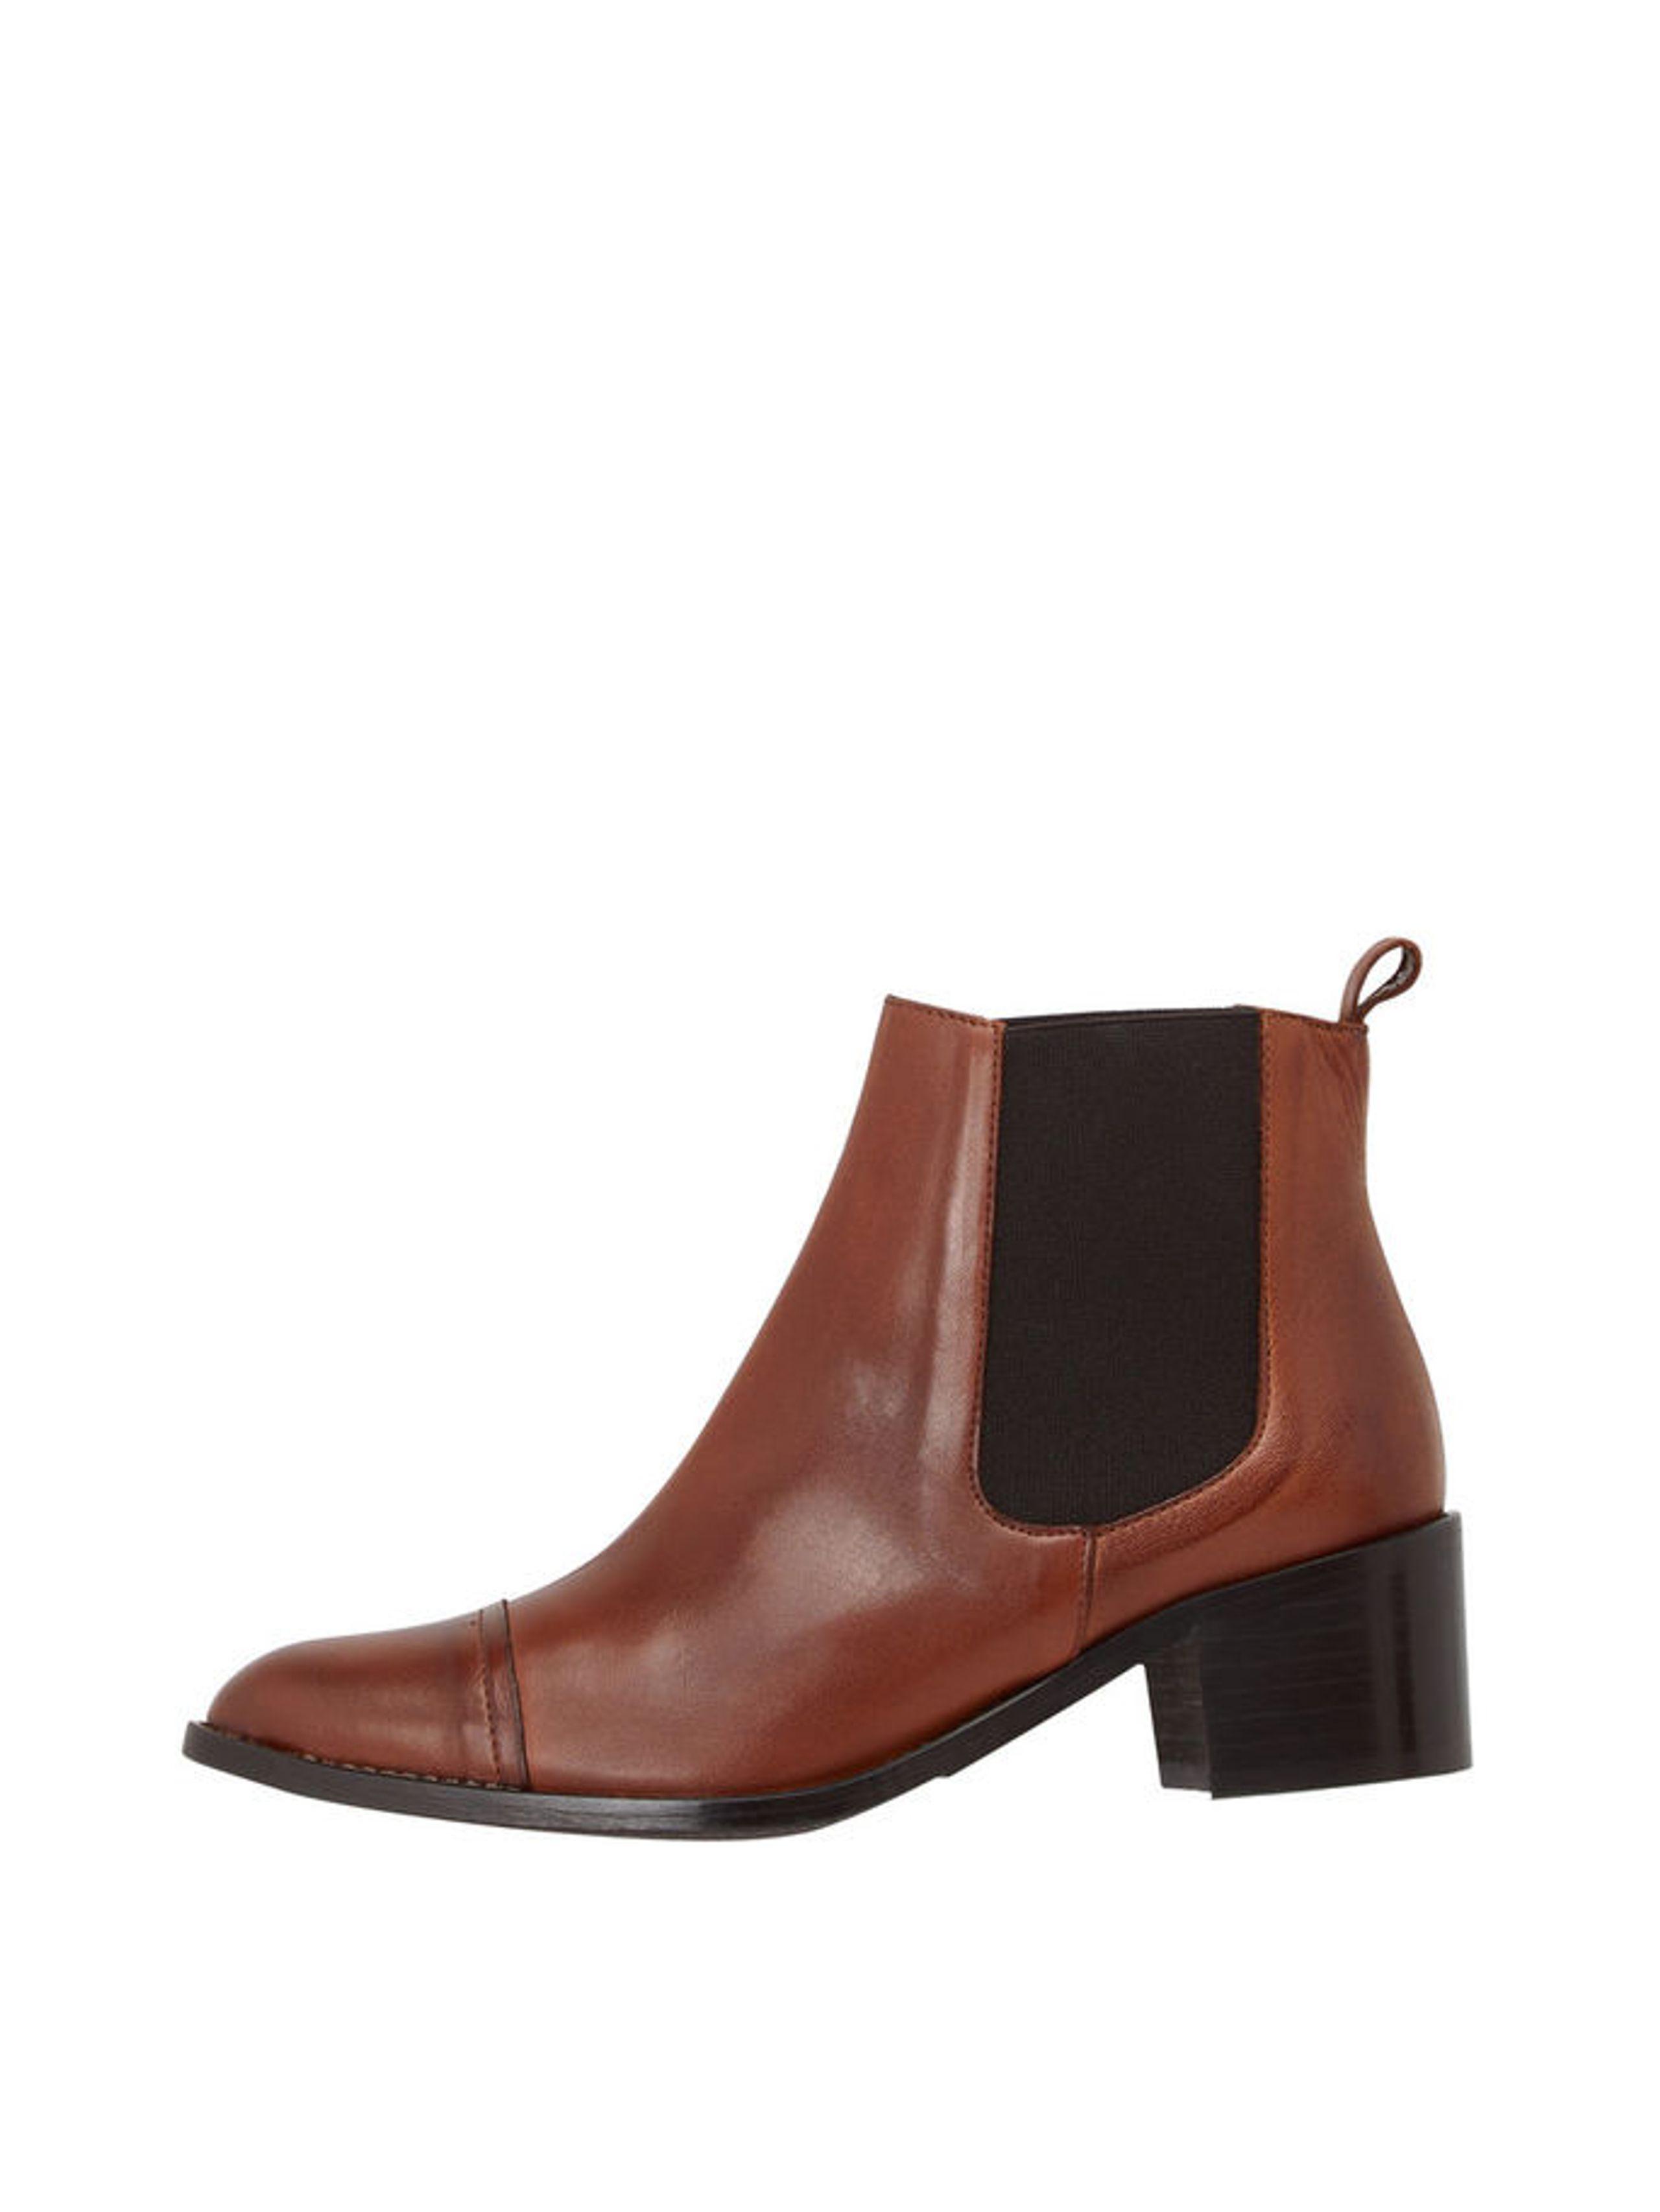 dress chelsea ankle boots ankle boots bianco. Black Bedroom Furniture Sets. Home Design Ideas